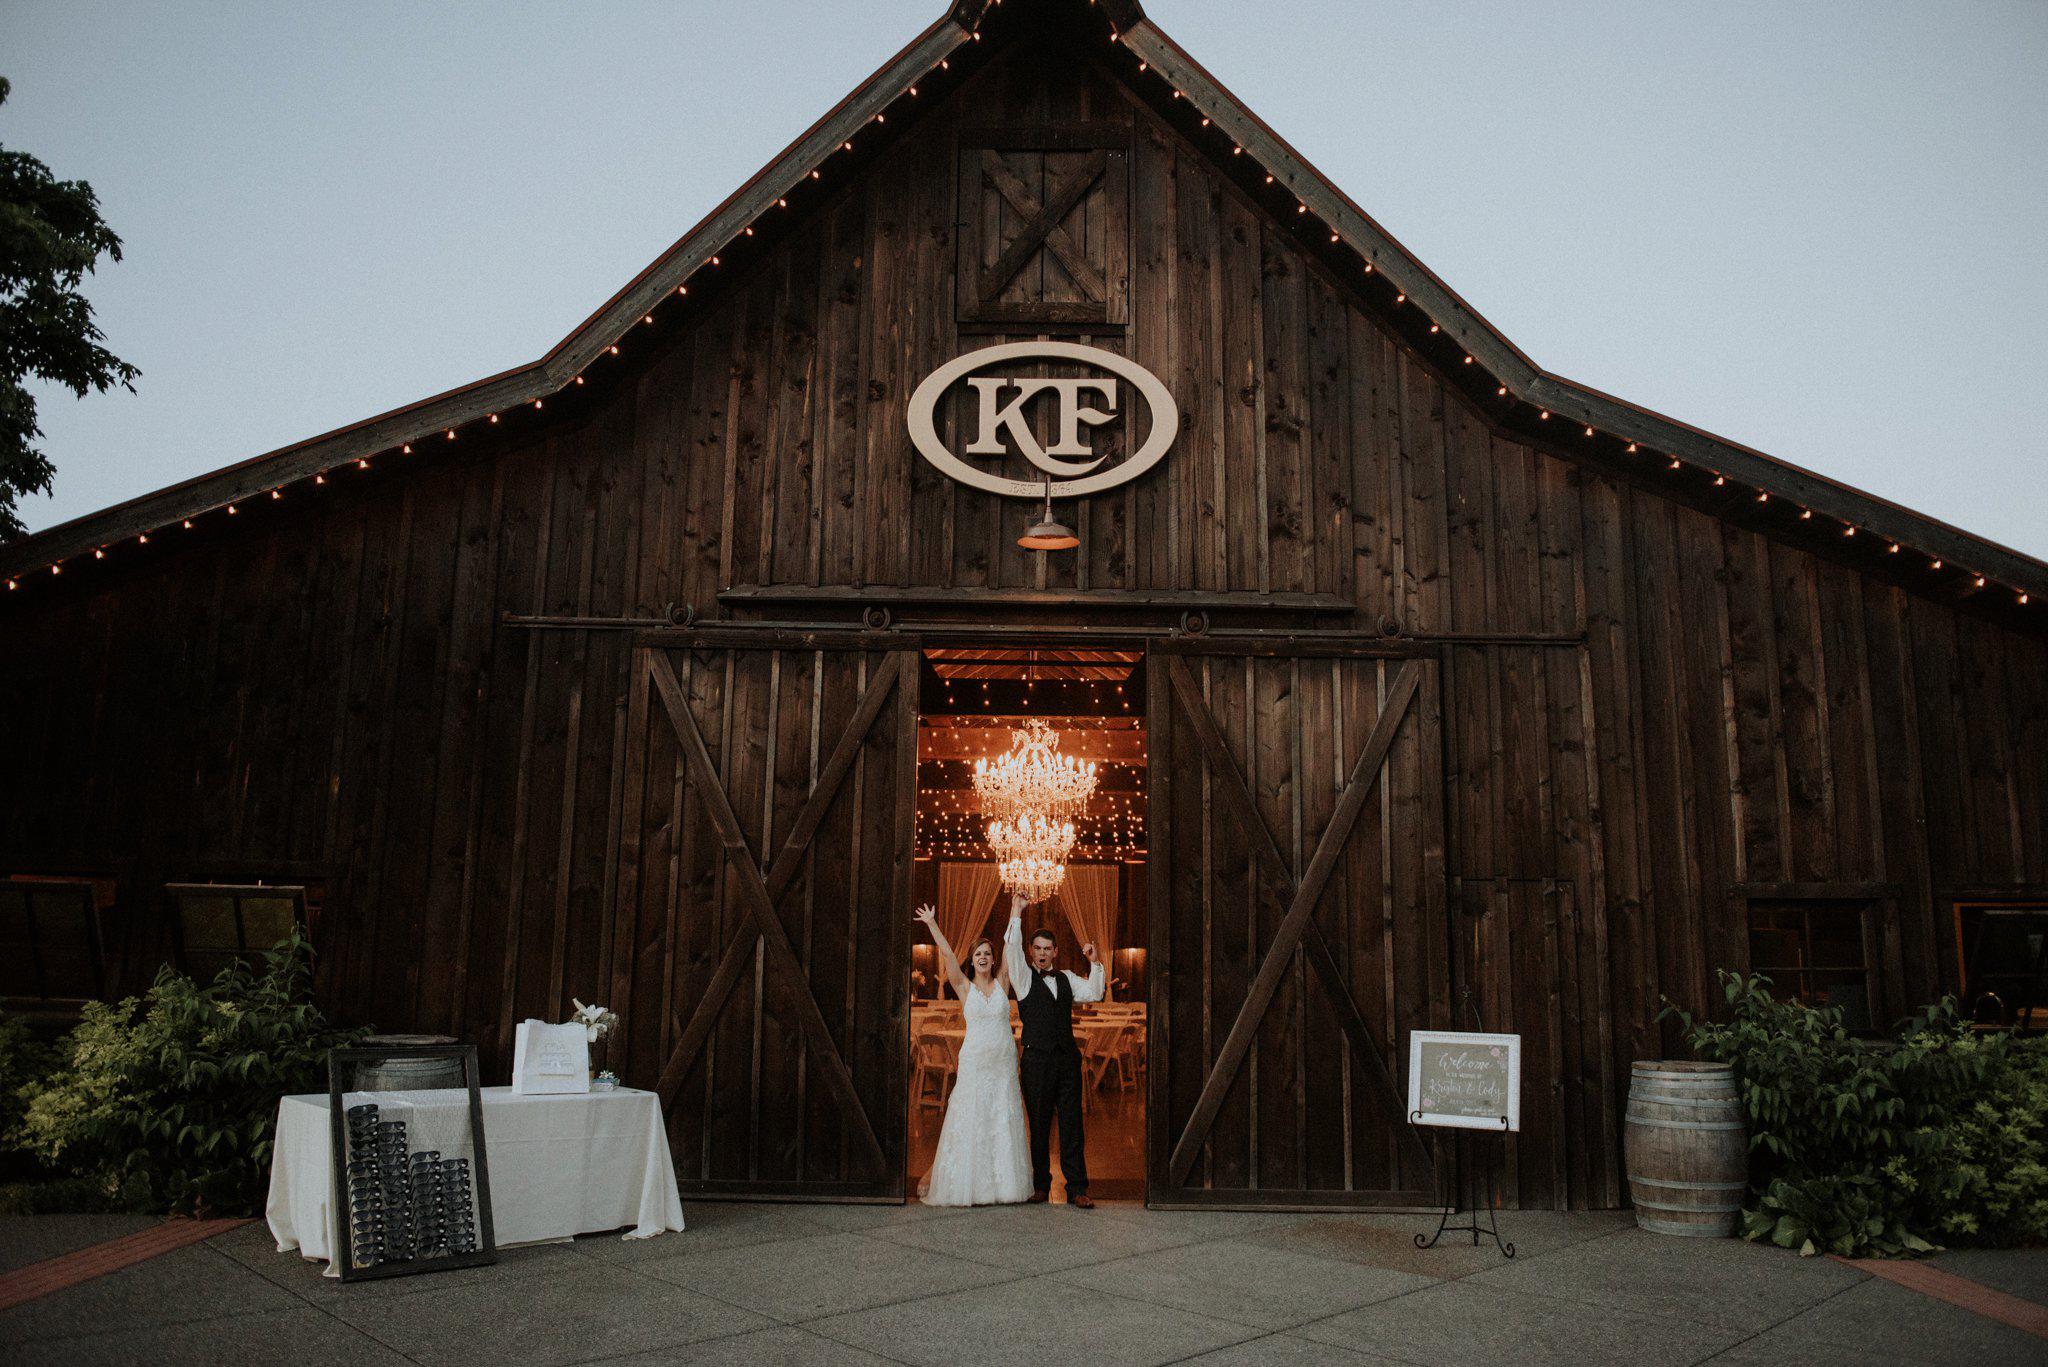 kristen-and-cody-the-kelley-farm-wedding-seattle-photographer-caitlyn-nikula-99.jpg